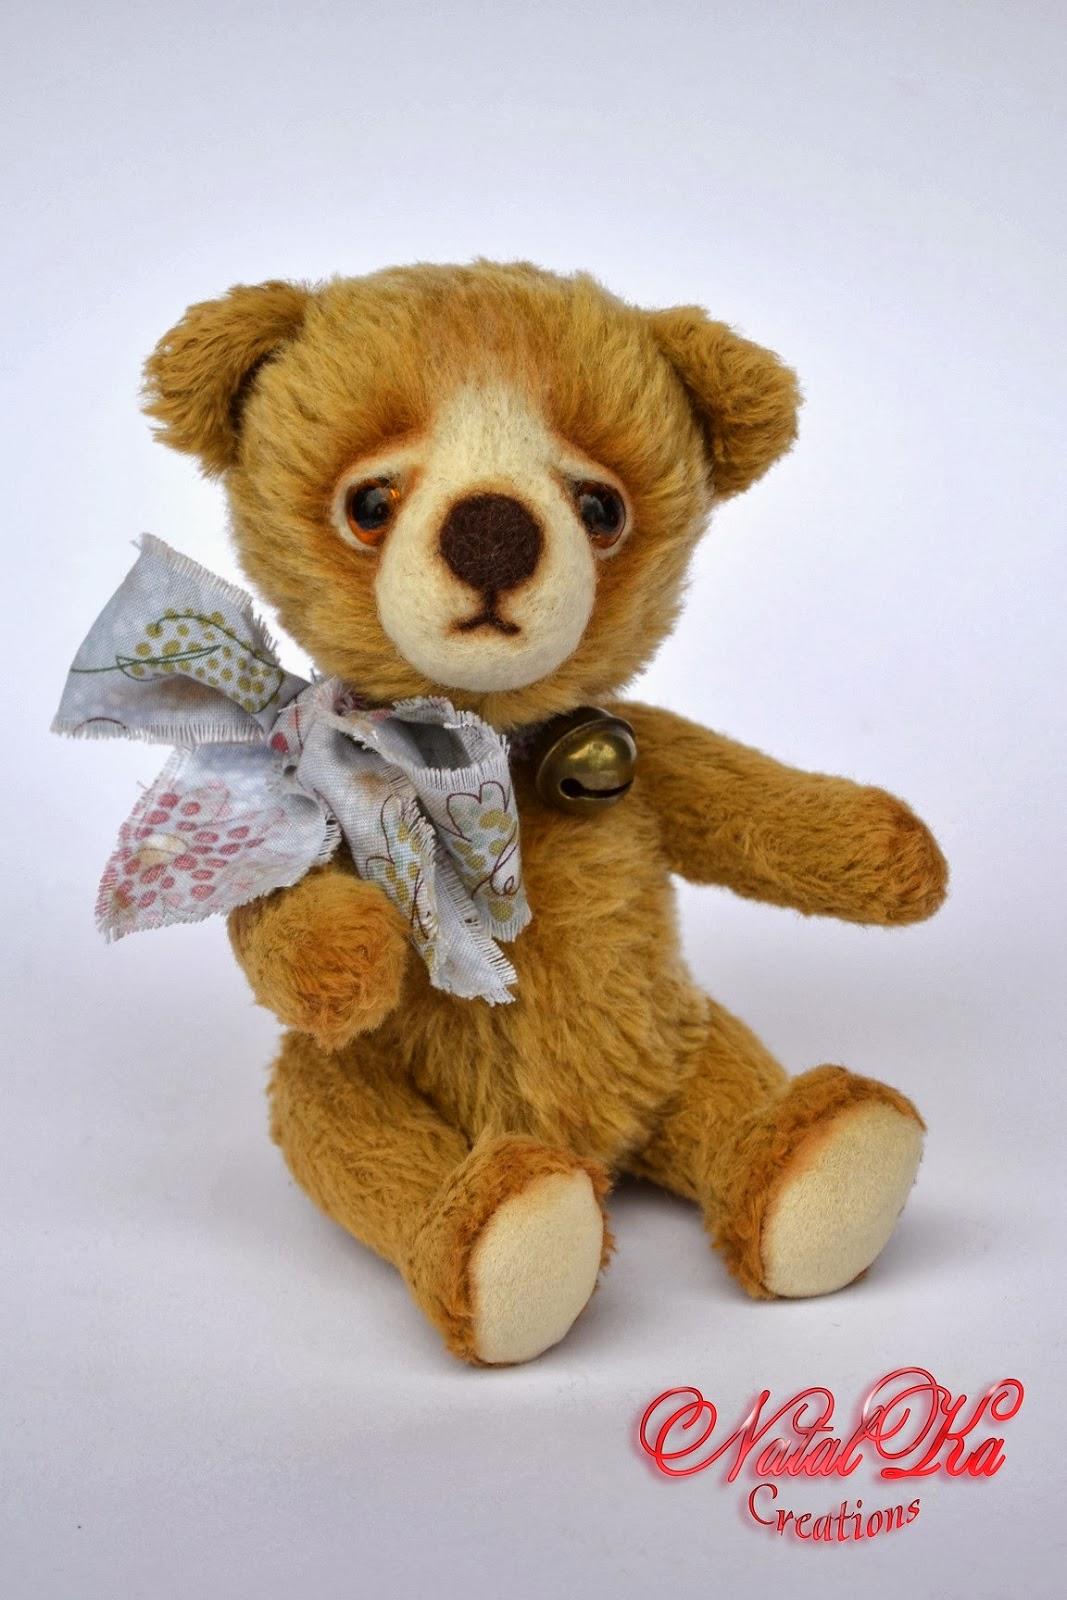 Artist teddy bear handmade by NatalKa Creations. Künstlerbär handgemacht von NatalKa Creations.